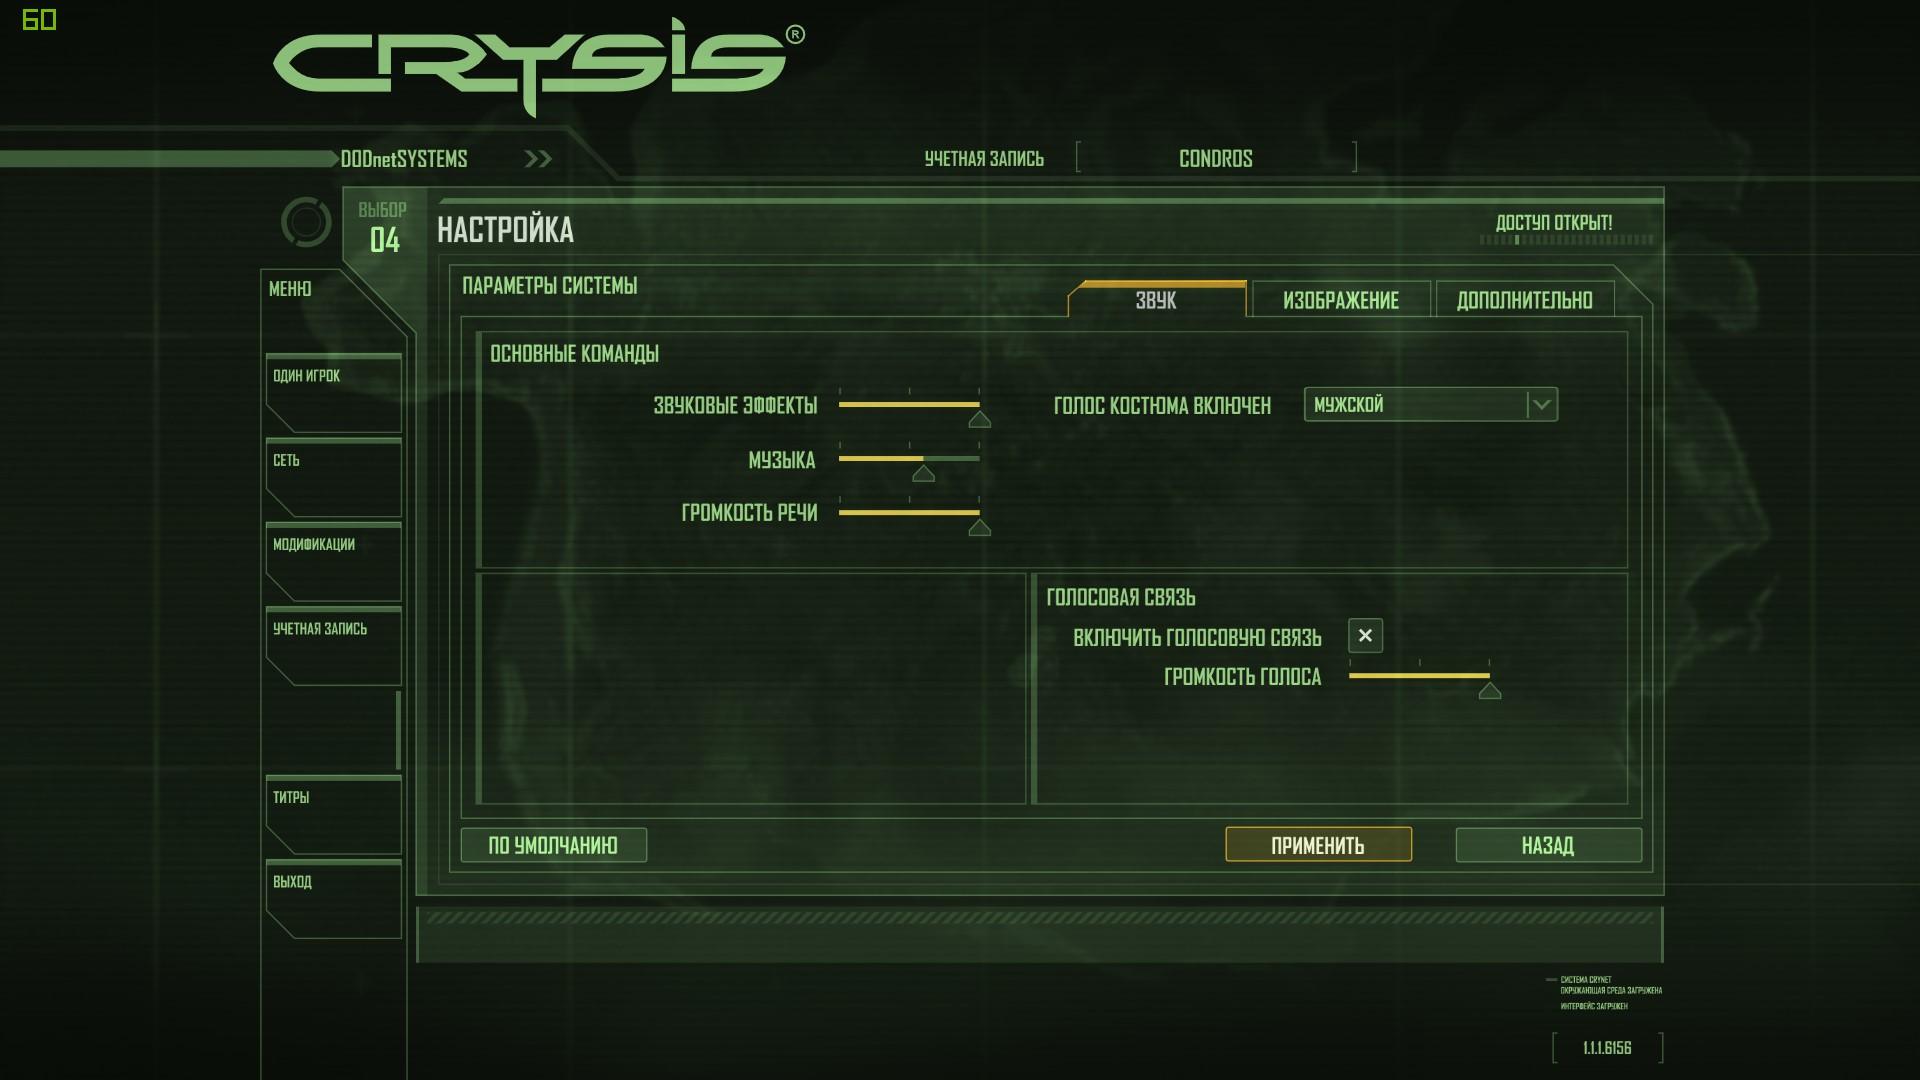 Crysis 2 голос нанокостюма (полный) youtube.